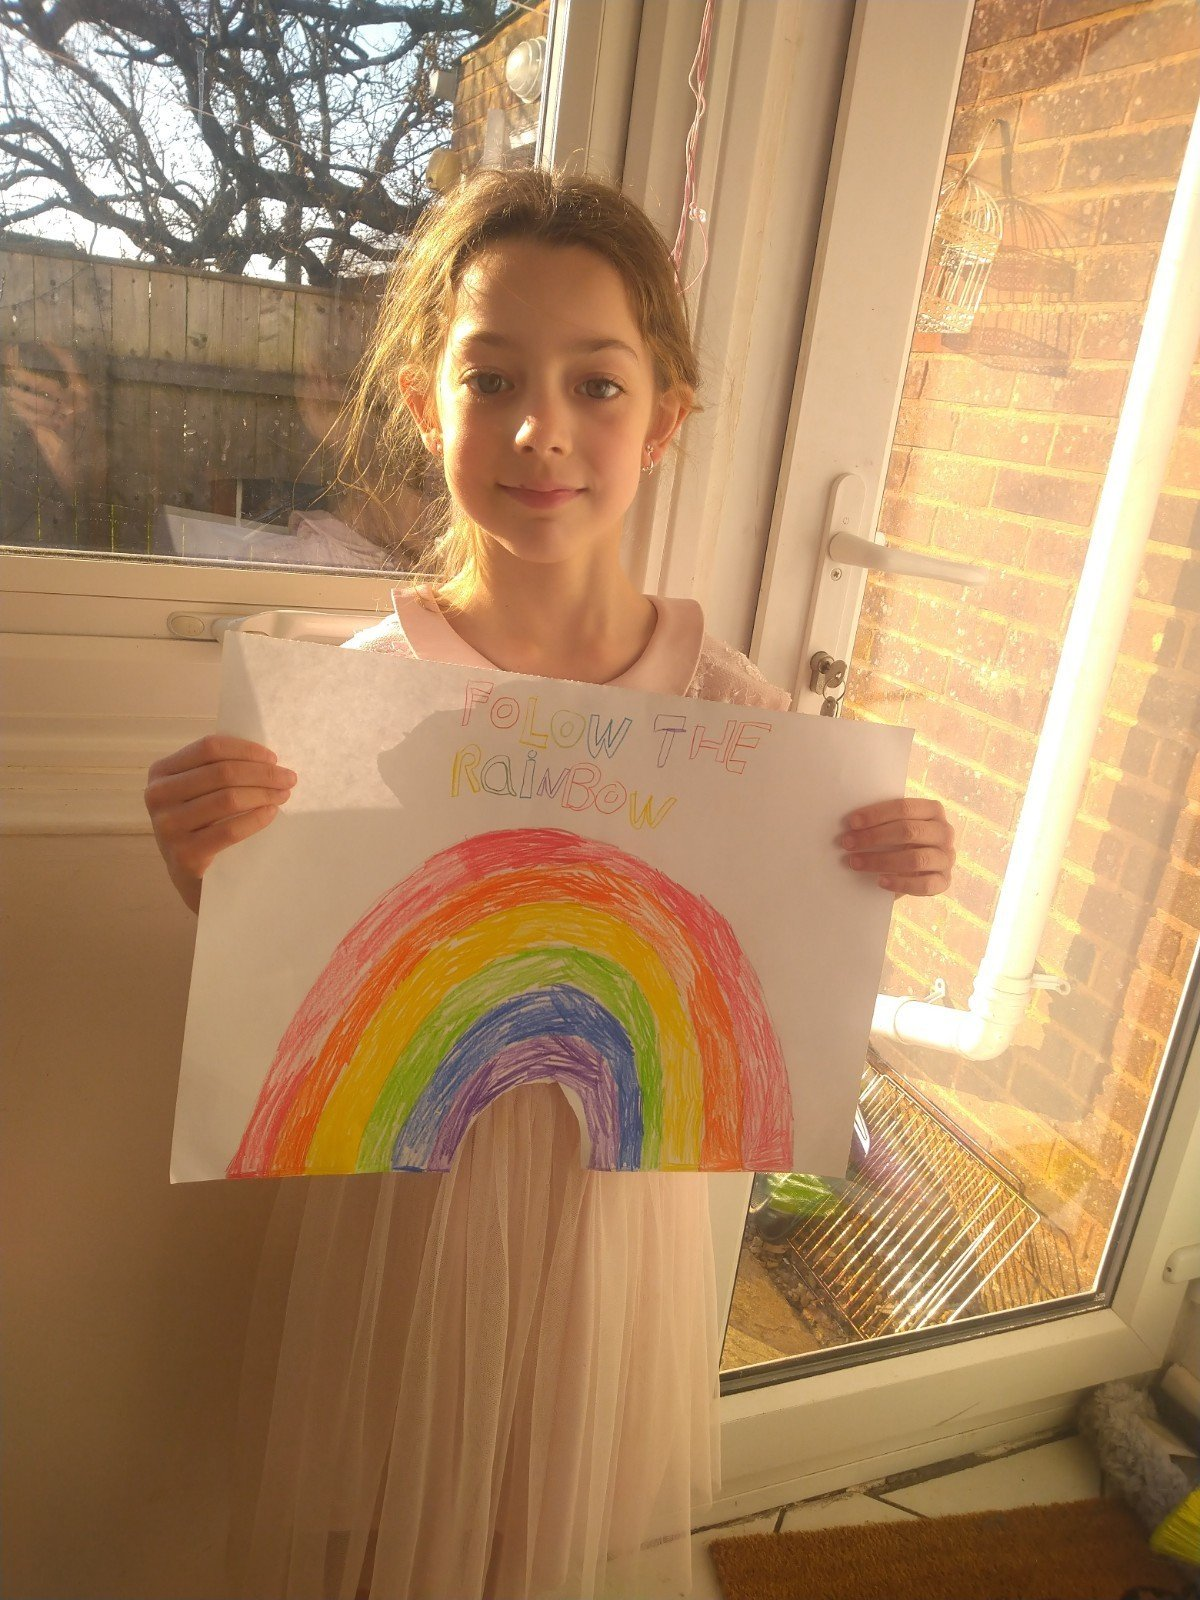 Rosie's colourful rainbow